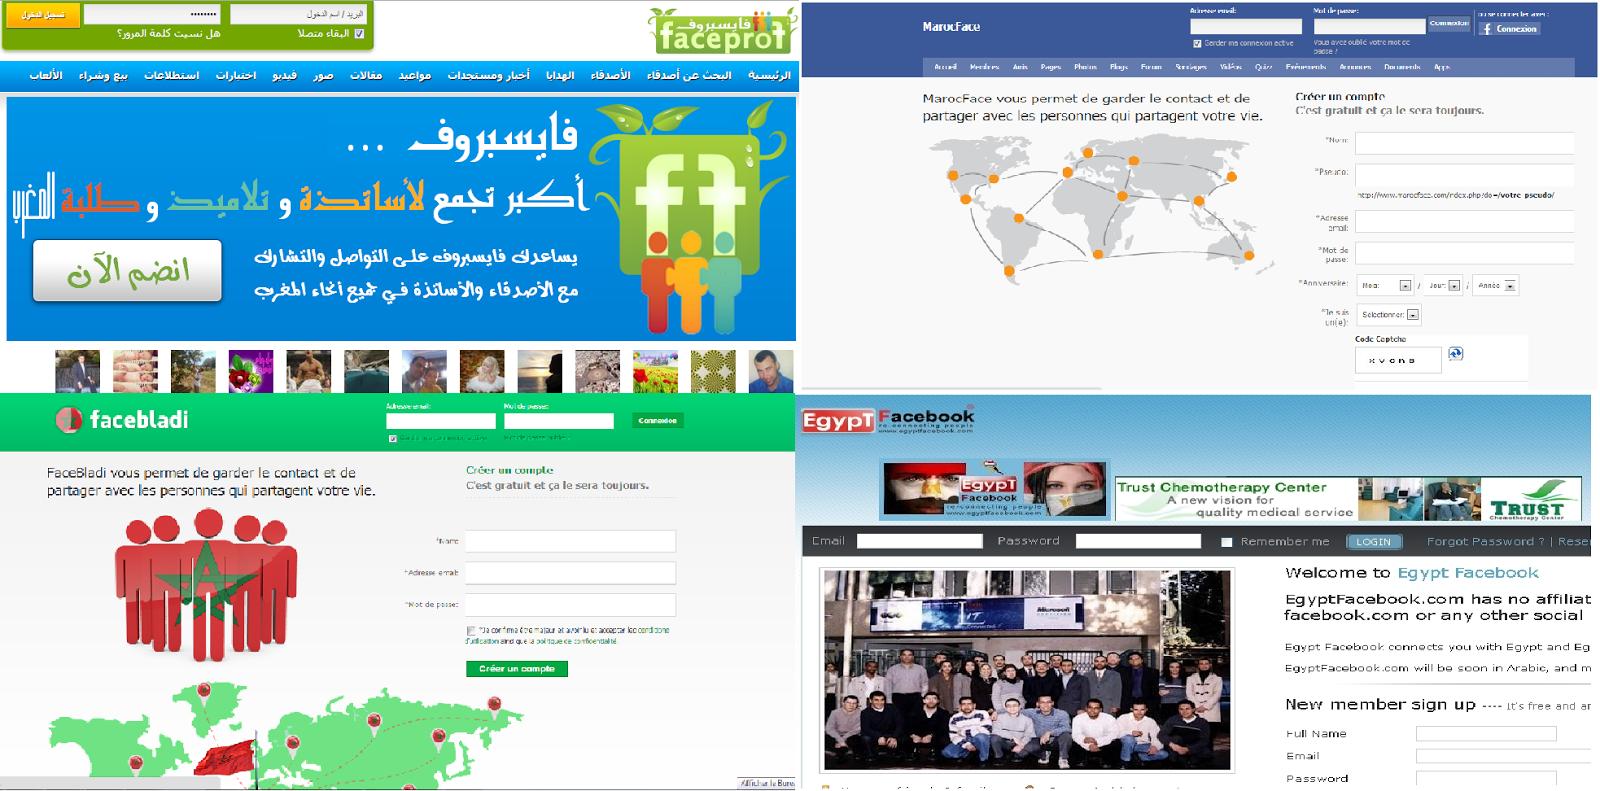 facebladi.ma Face Bladi Maroc Réseau social marocain FaceBook facebiladi